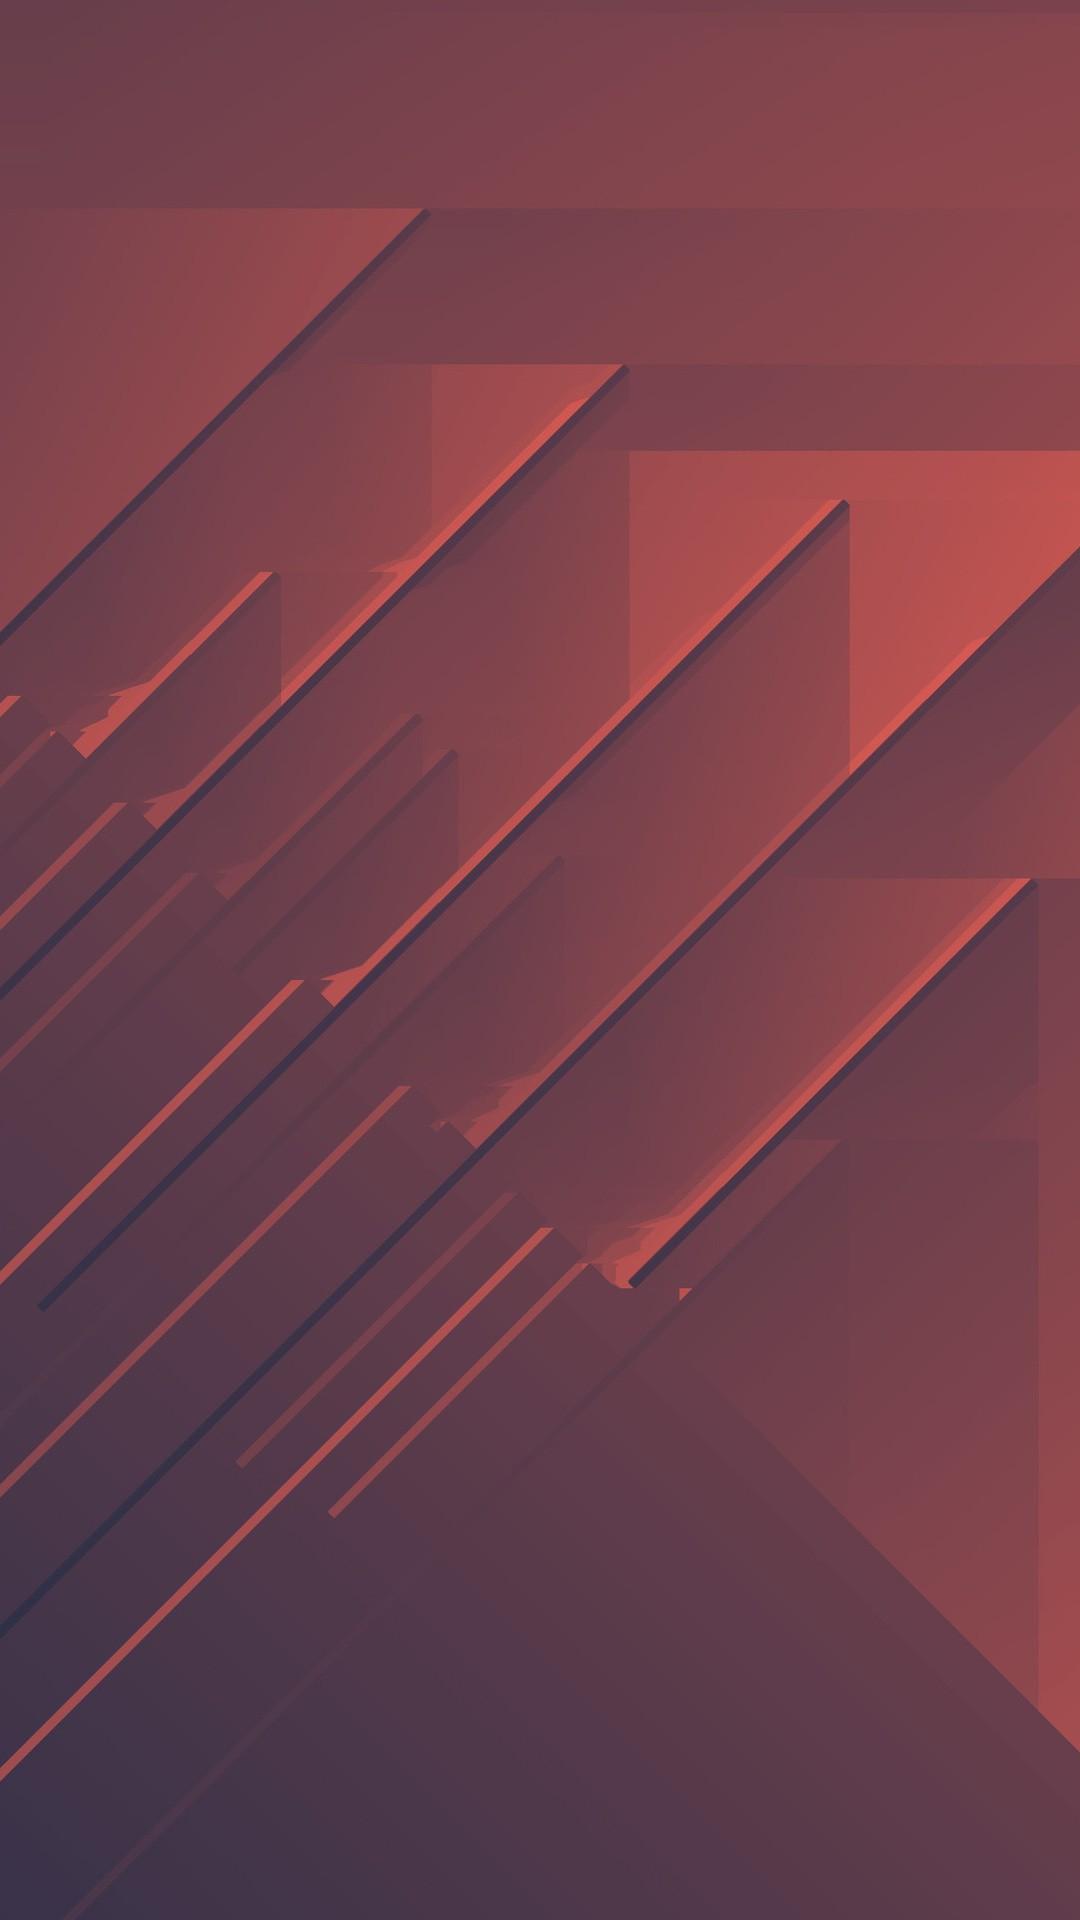 Abstract Minimalism Hd Io Wallpaper - Minimalist Abstract Wallpaper Phone - HD Wallpaper